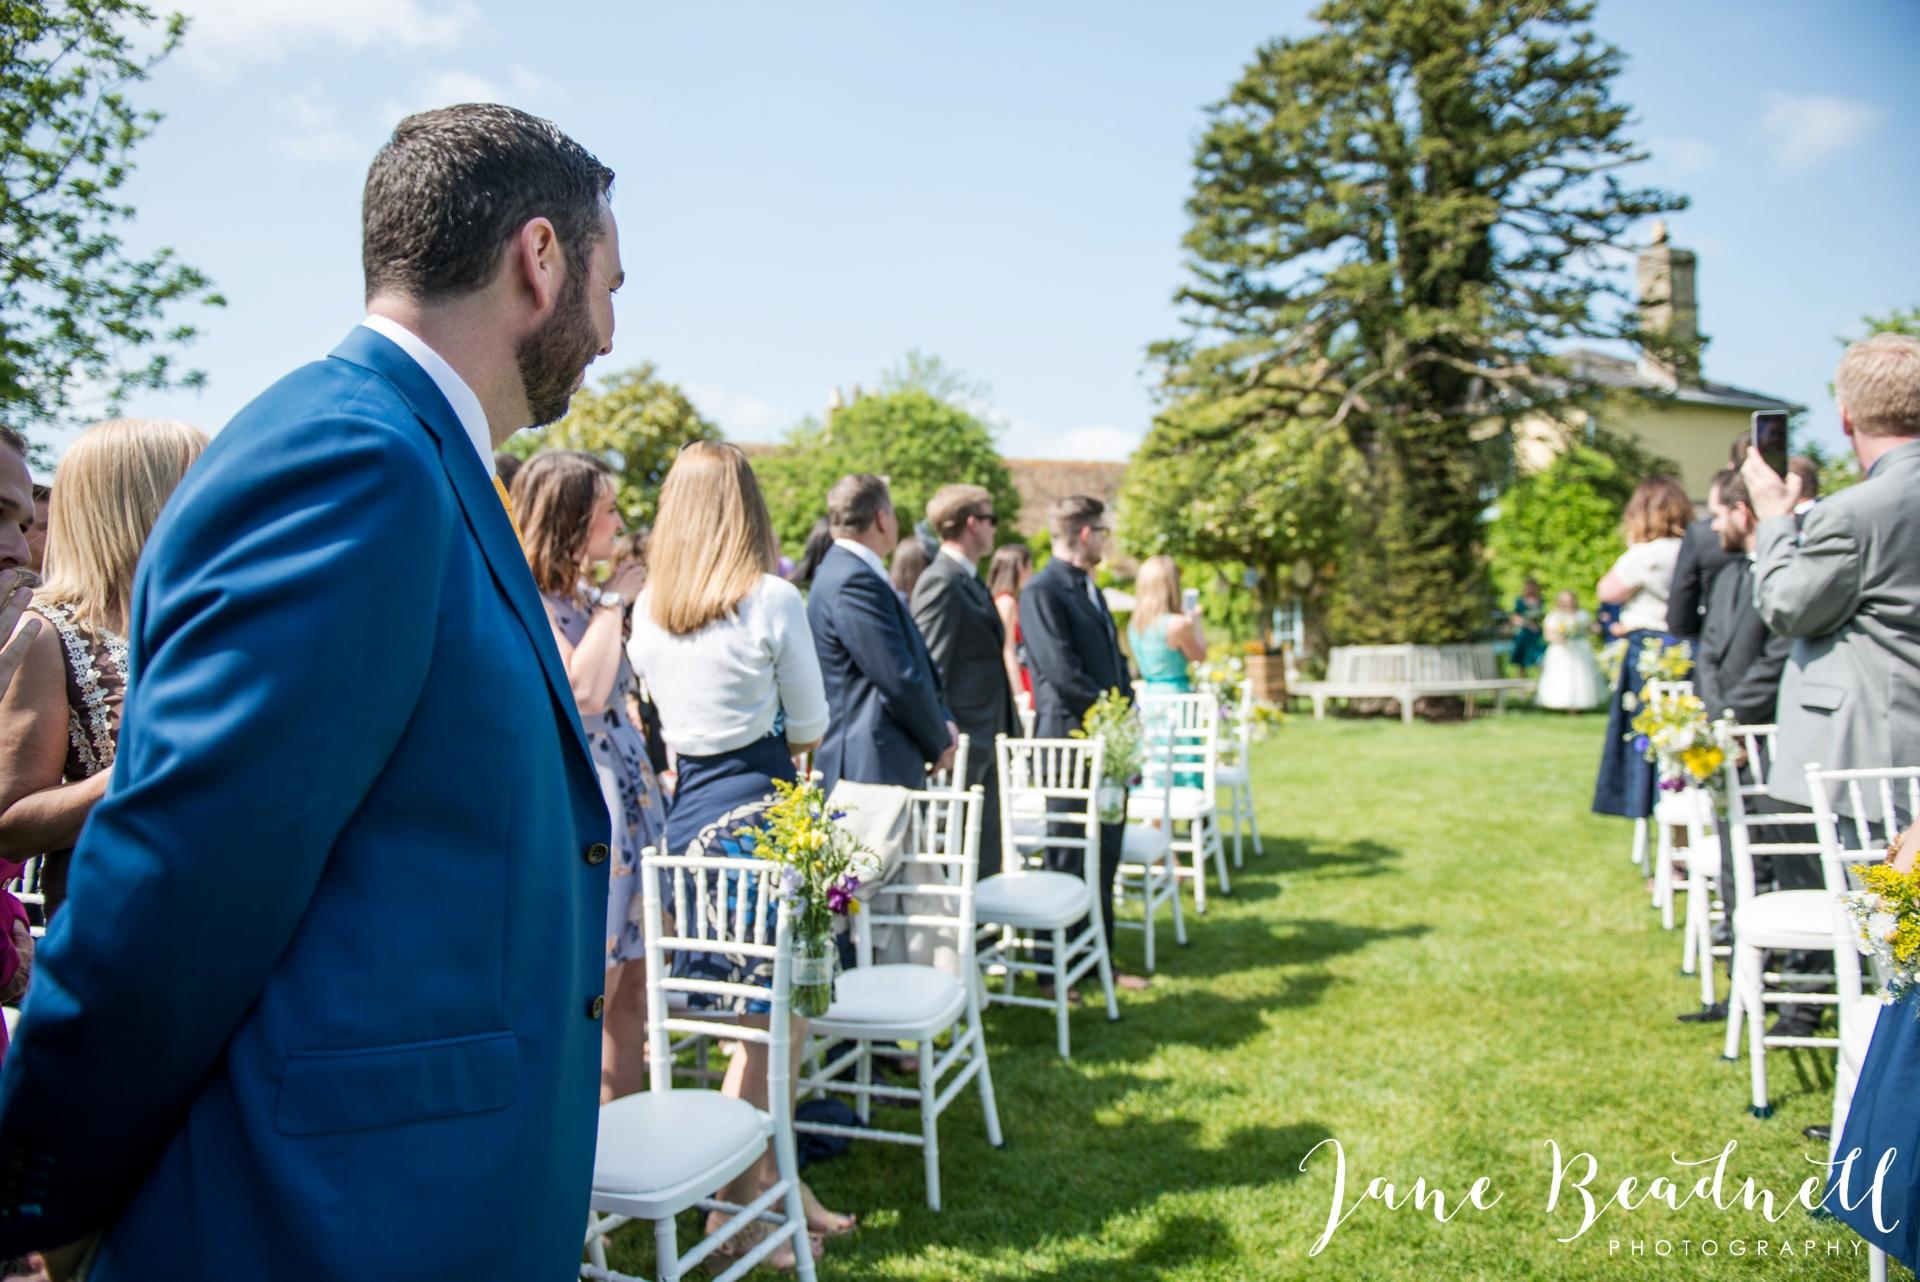 South Farm Wedding photography Hertfordshire by Jane Beadnell Photography fine art wedding photographer_0059